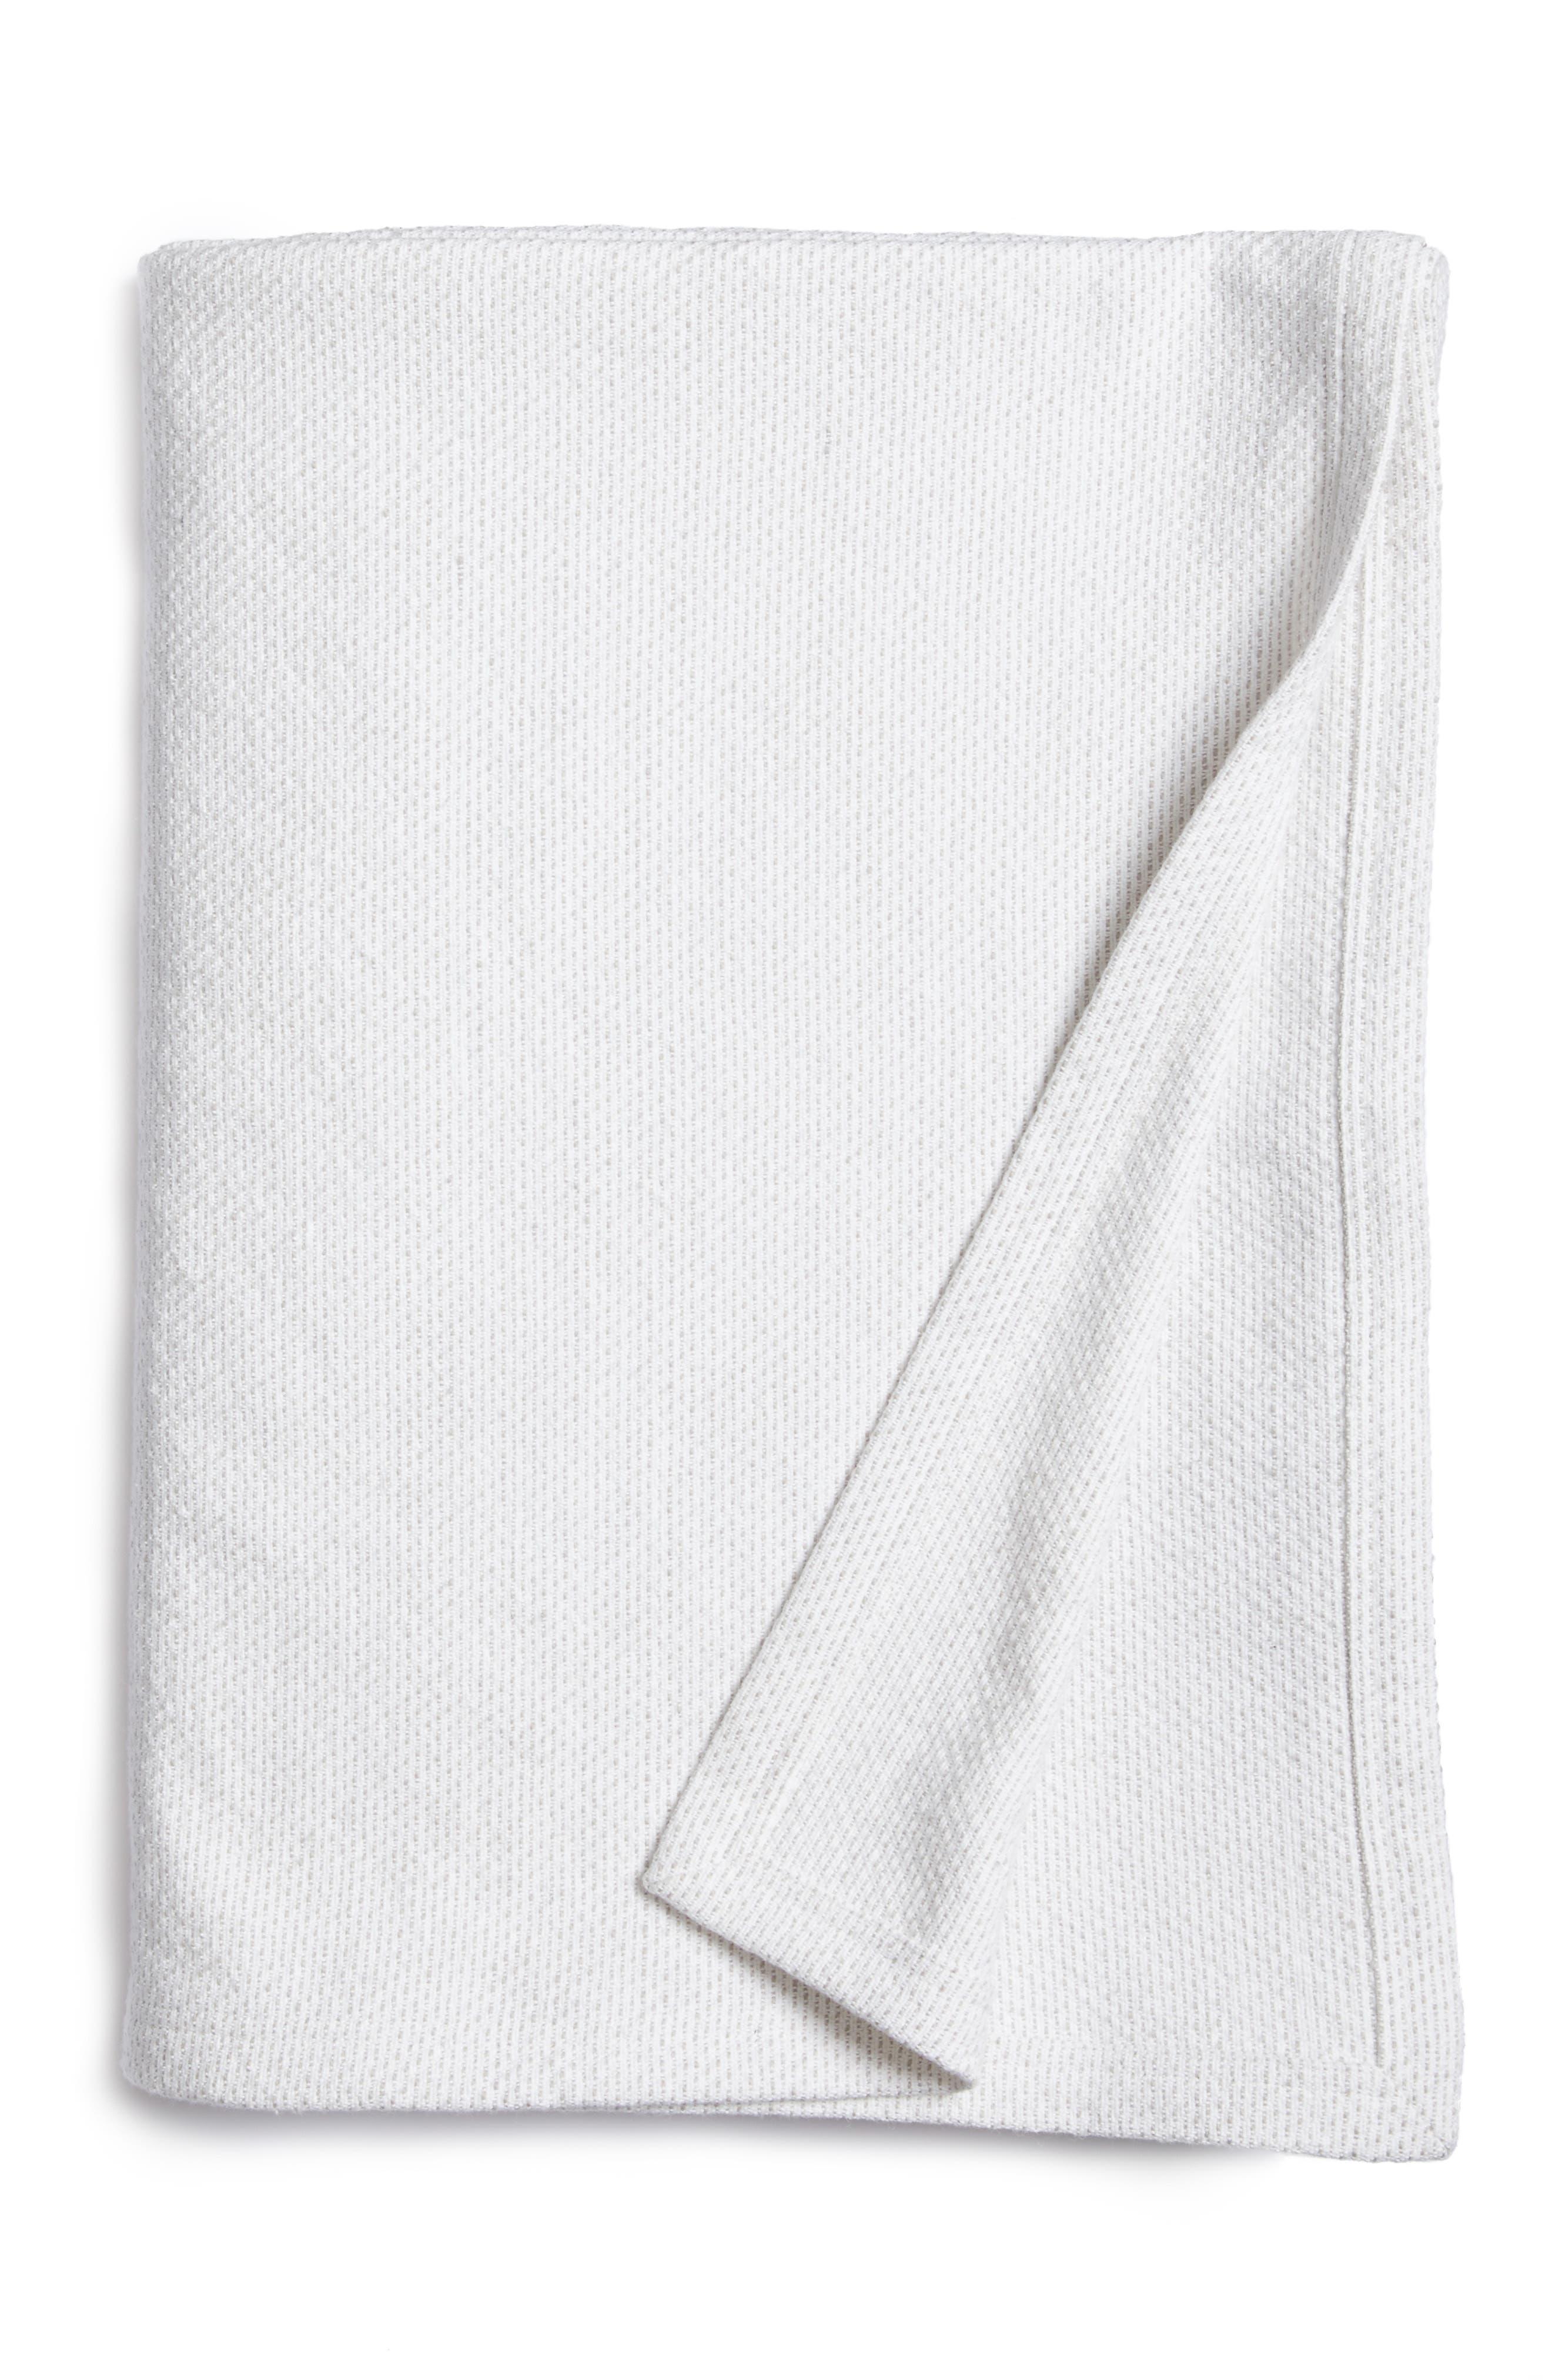 Main Image - Calvin Klein Arctic Blanket